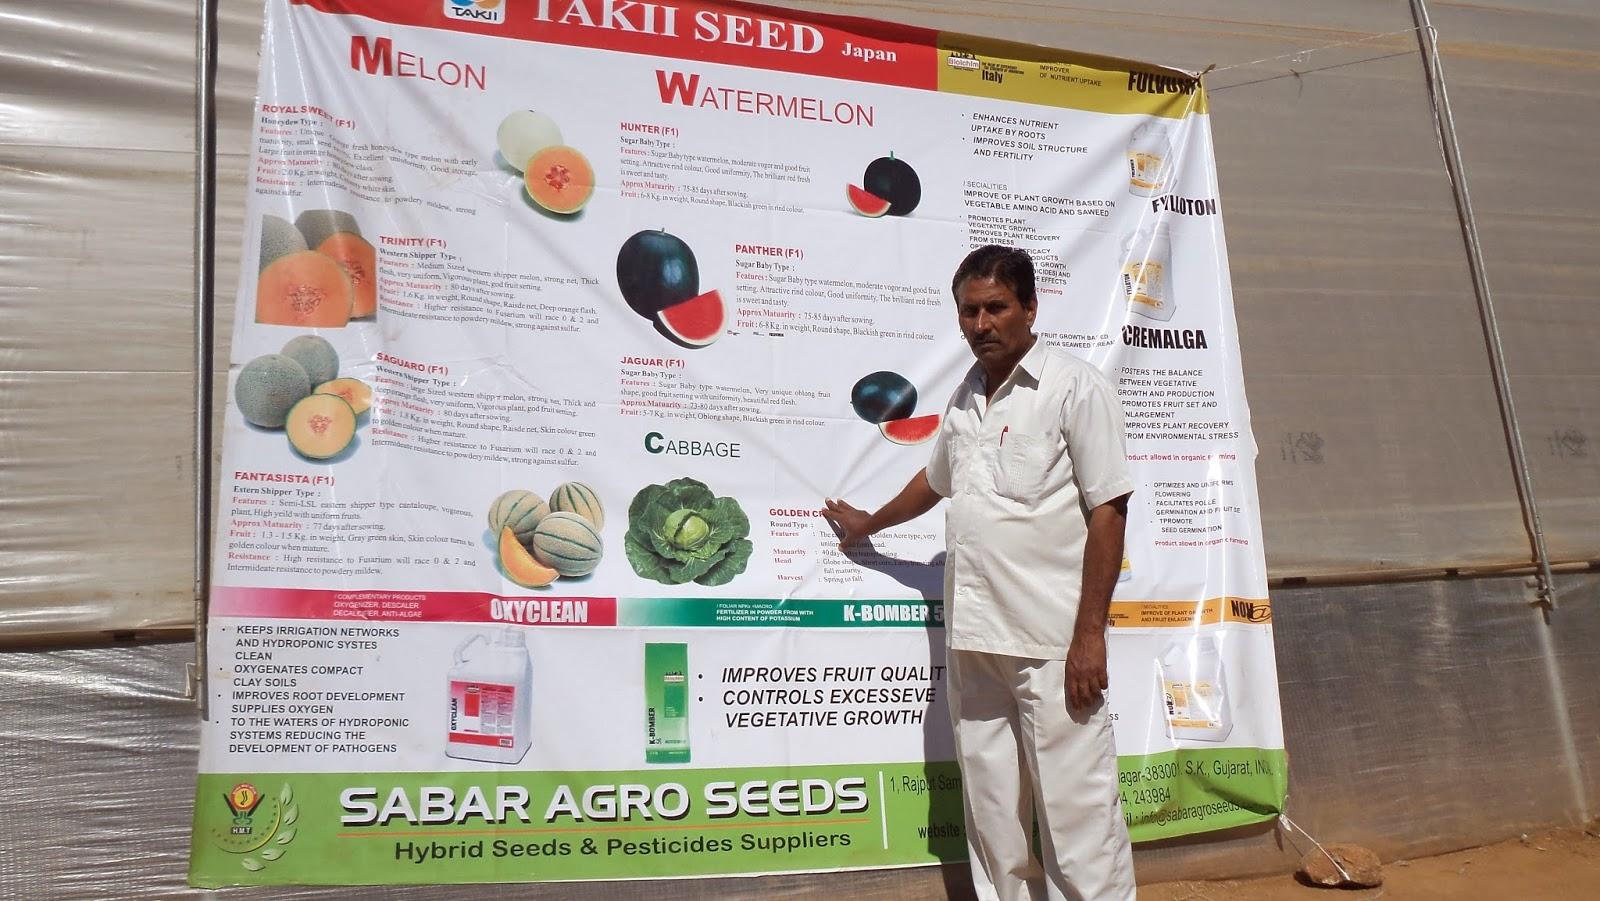 sabar agro seeds : 2014